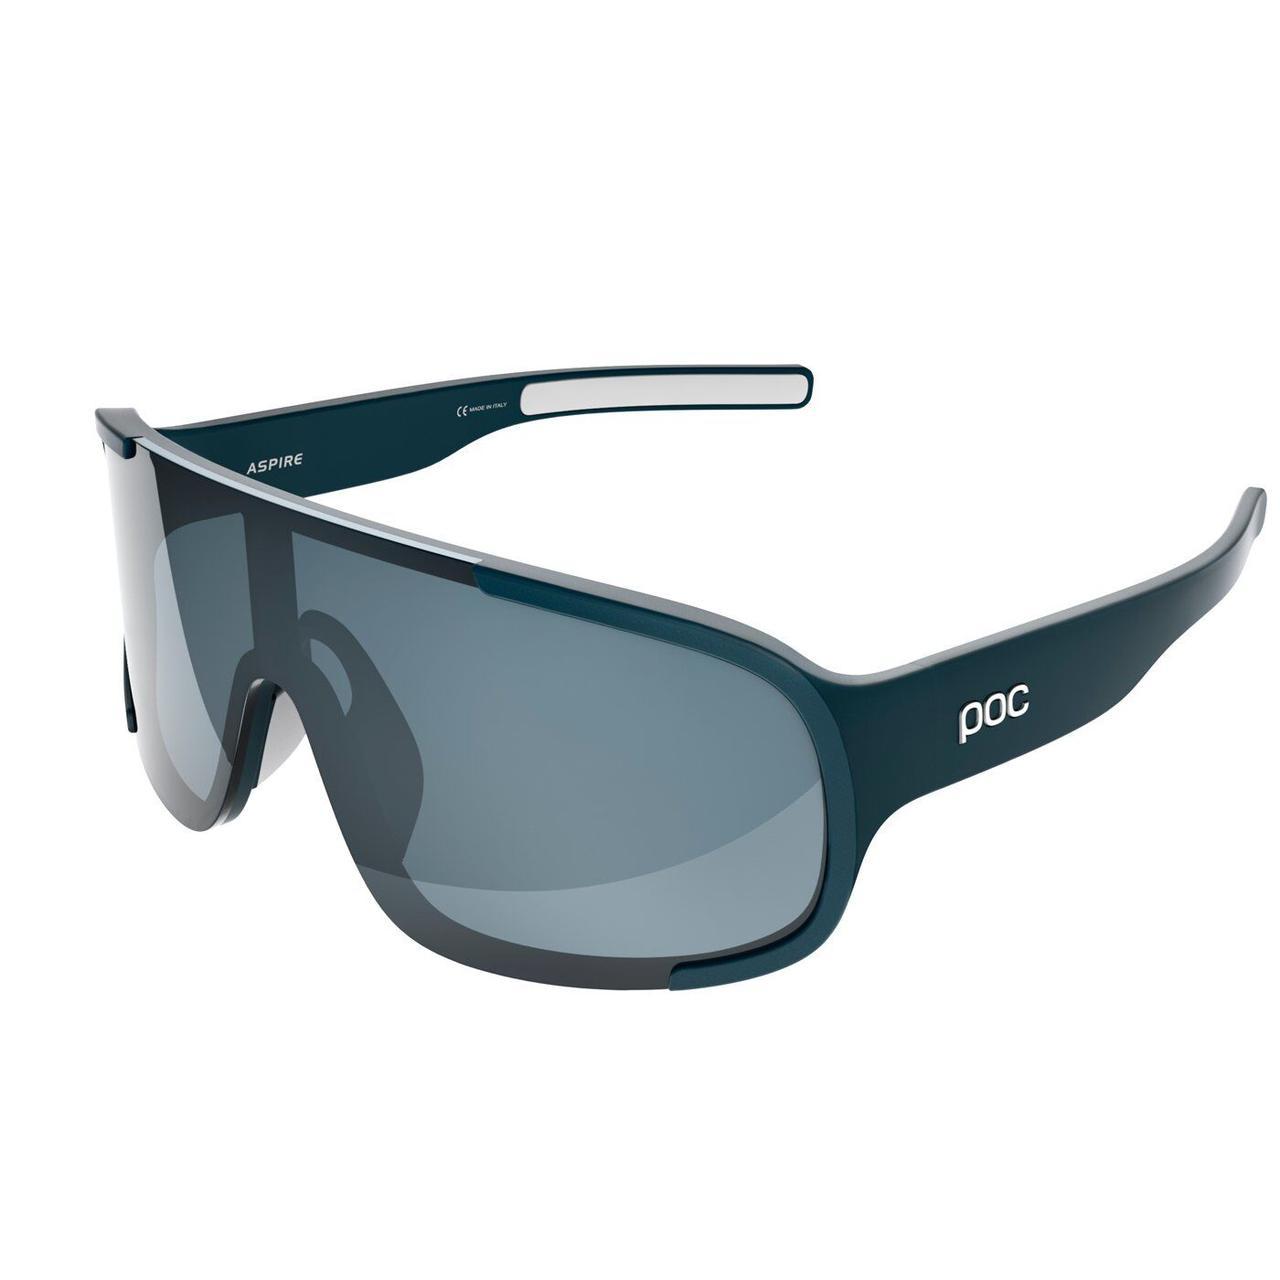 Окуляри POC Aspire Navy Black/Blue/Silver Mirror